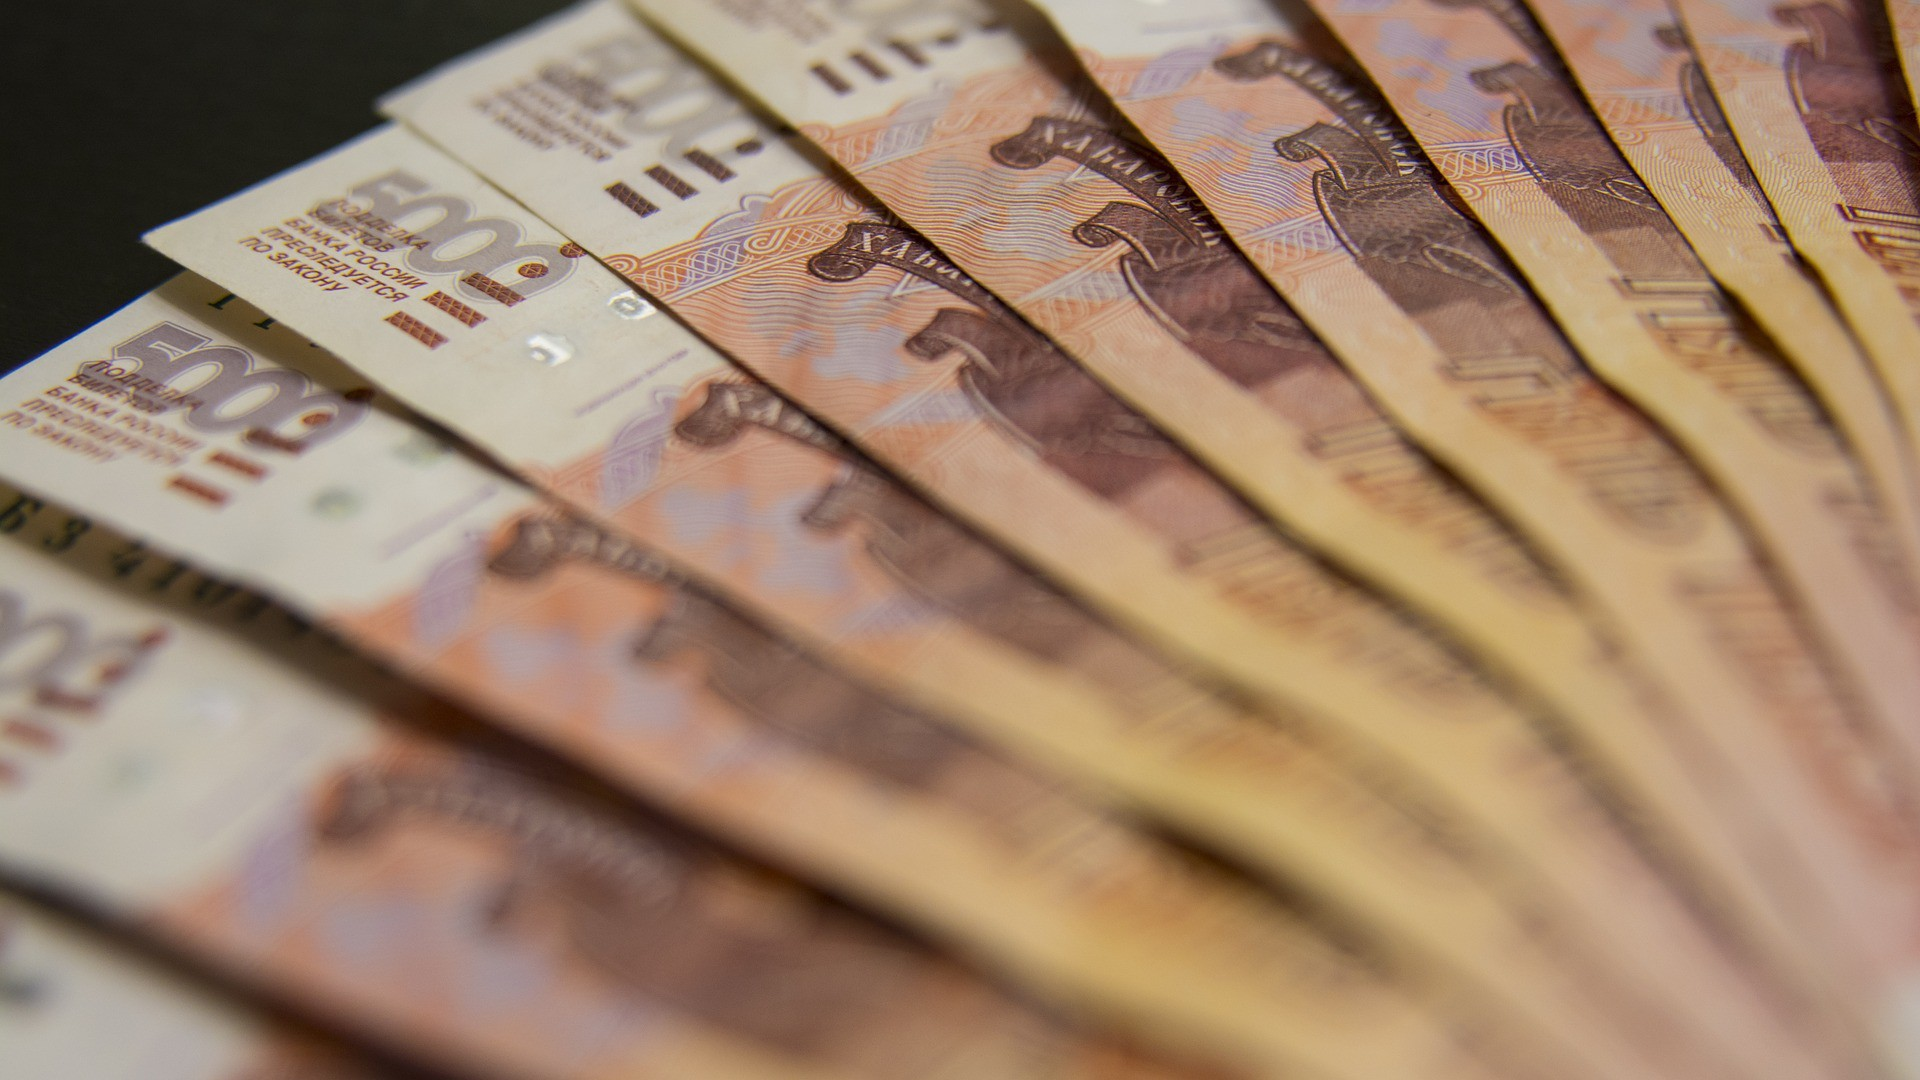 ВБурятии пенсионерка объявила себя банкротом, набрав кредитов на6 млн. руб.